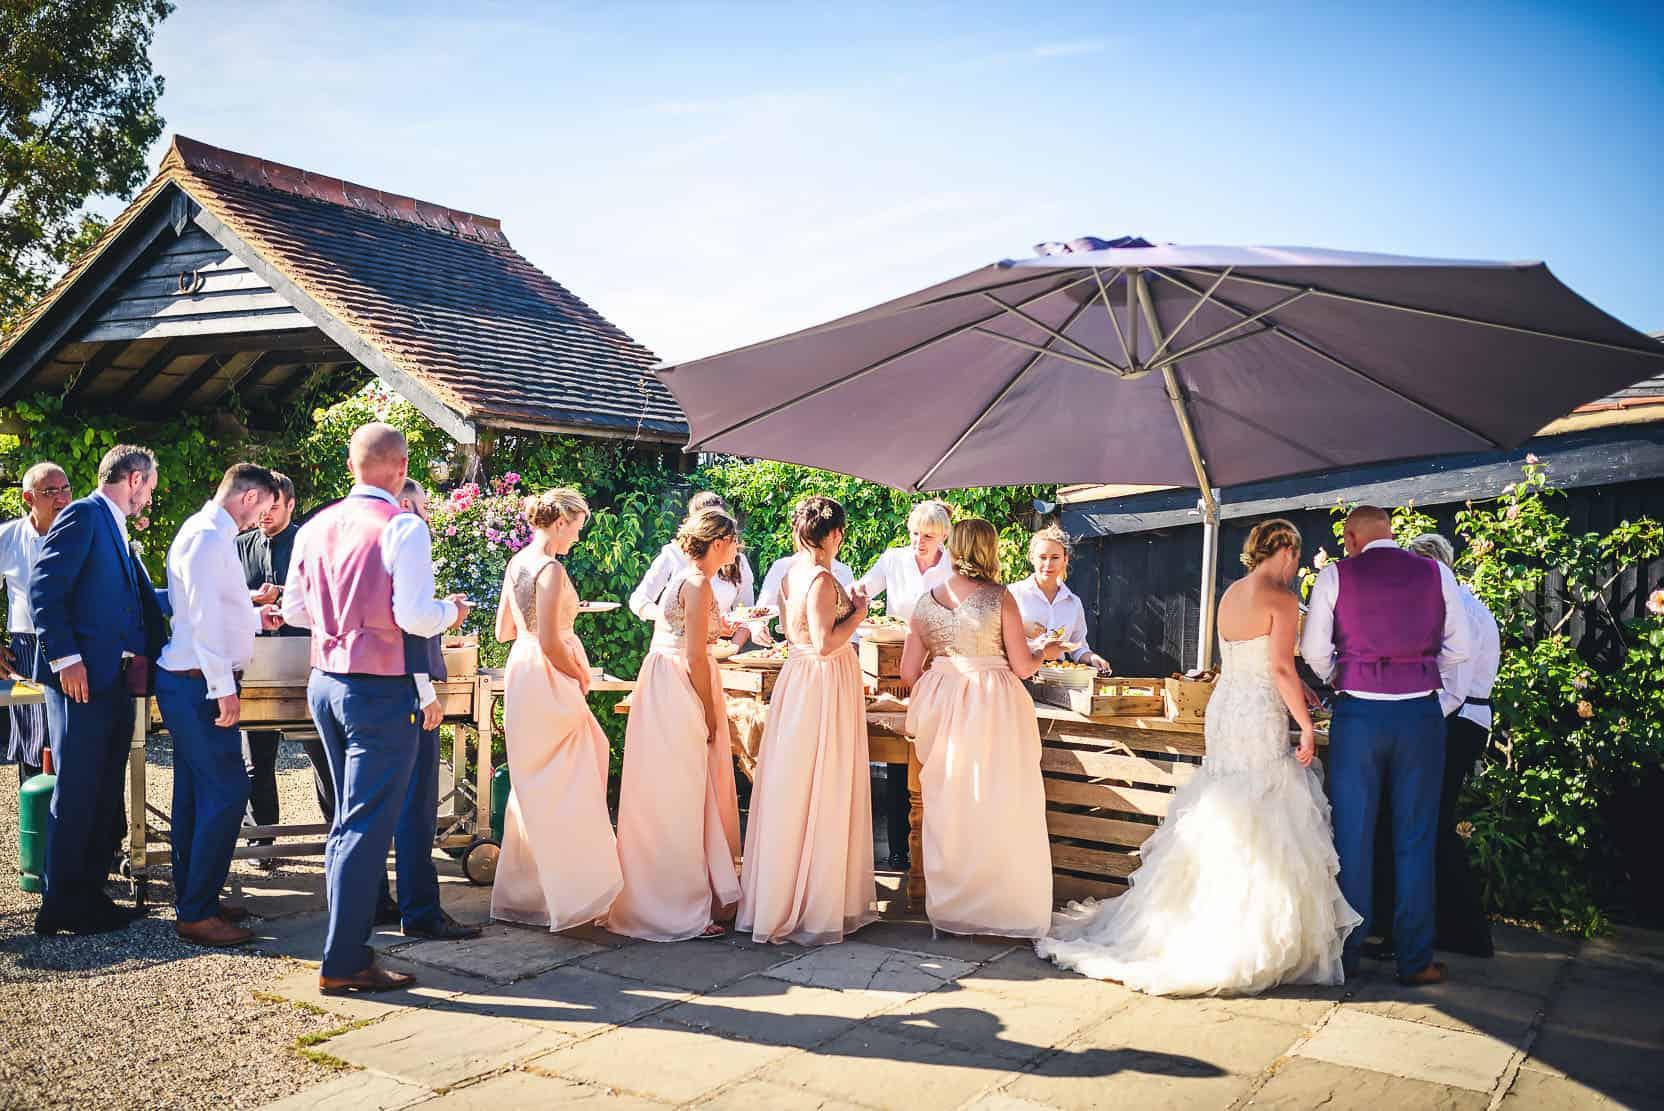 026_Maidens_Barn_Wedding_Essex_NJ_Justin_Bailey_Photography